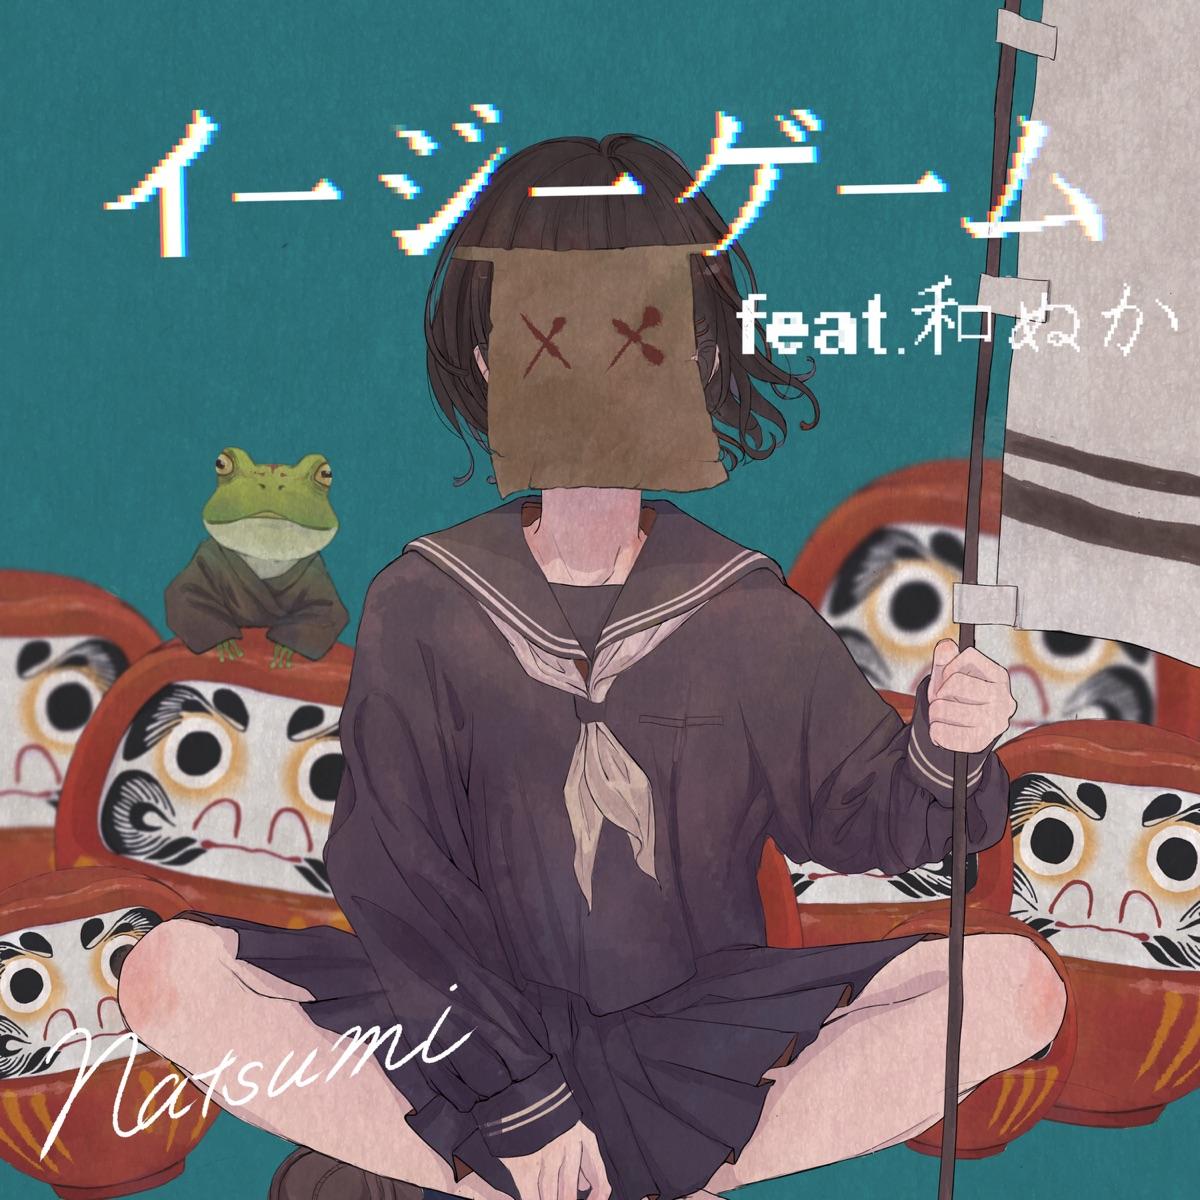 『natsumi - イージーゲーム (feat. 和ぬか)』収録の『イージーゲーム feat. 和ぬか』ジャケット